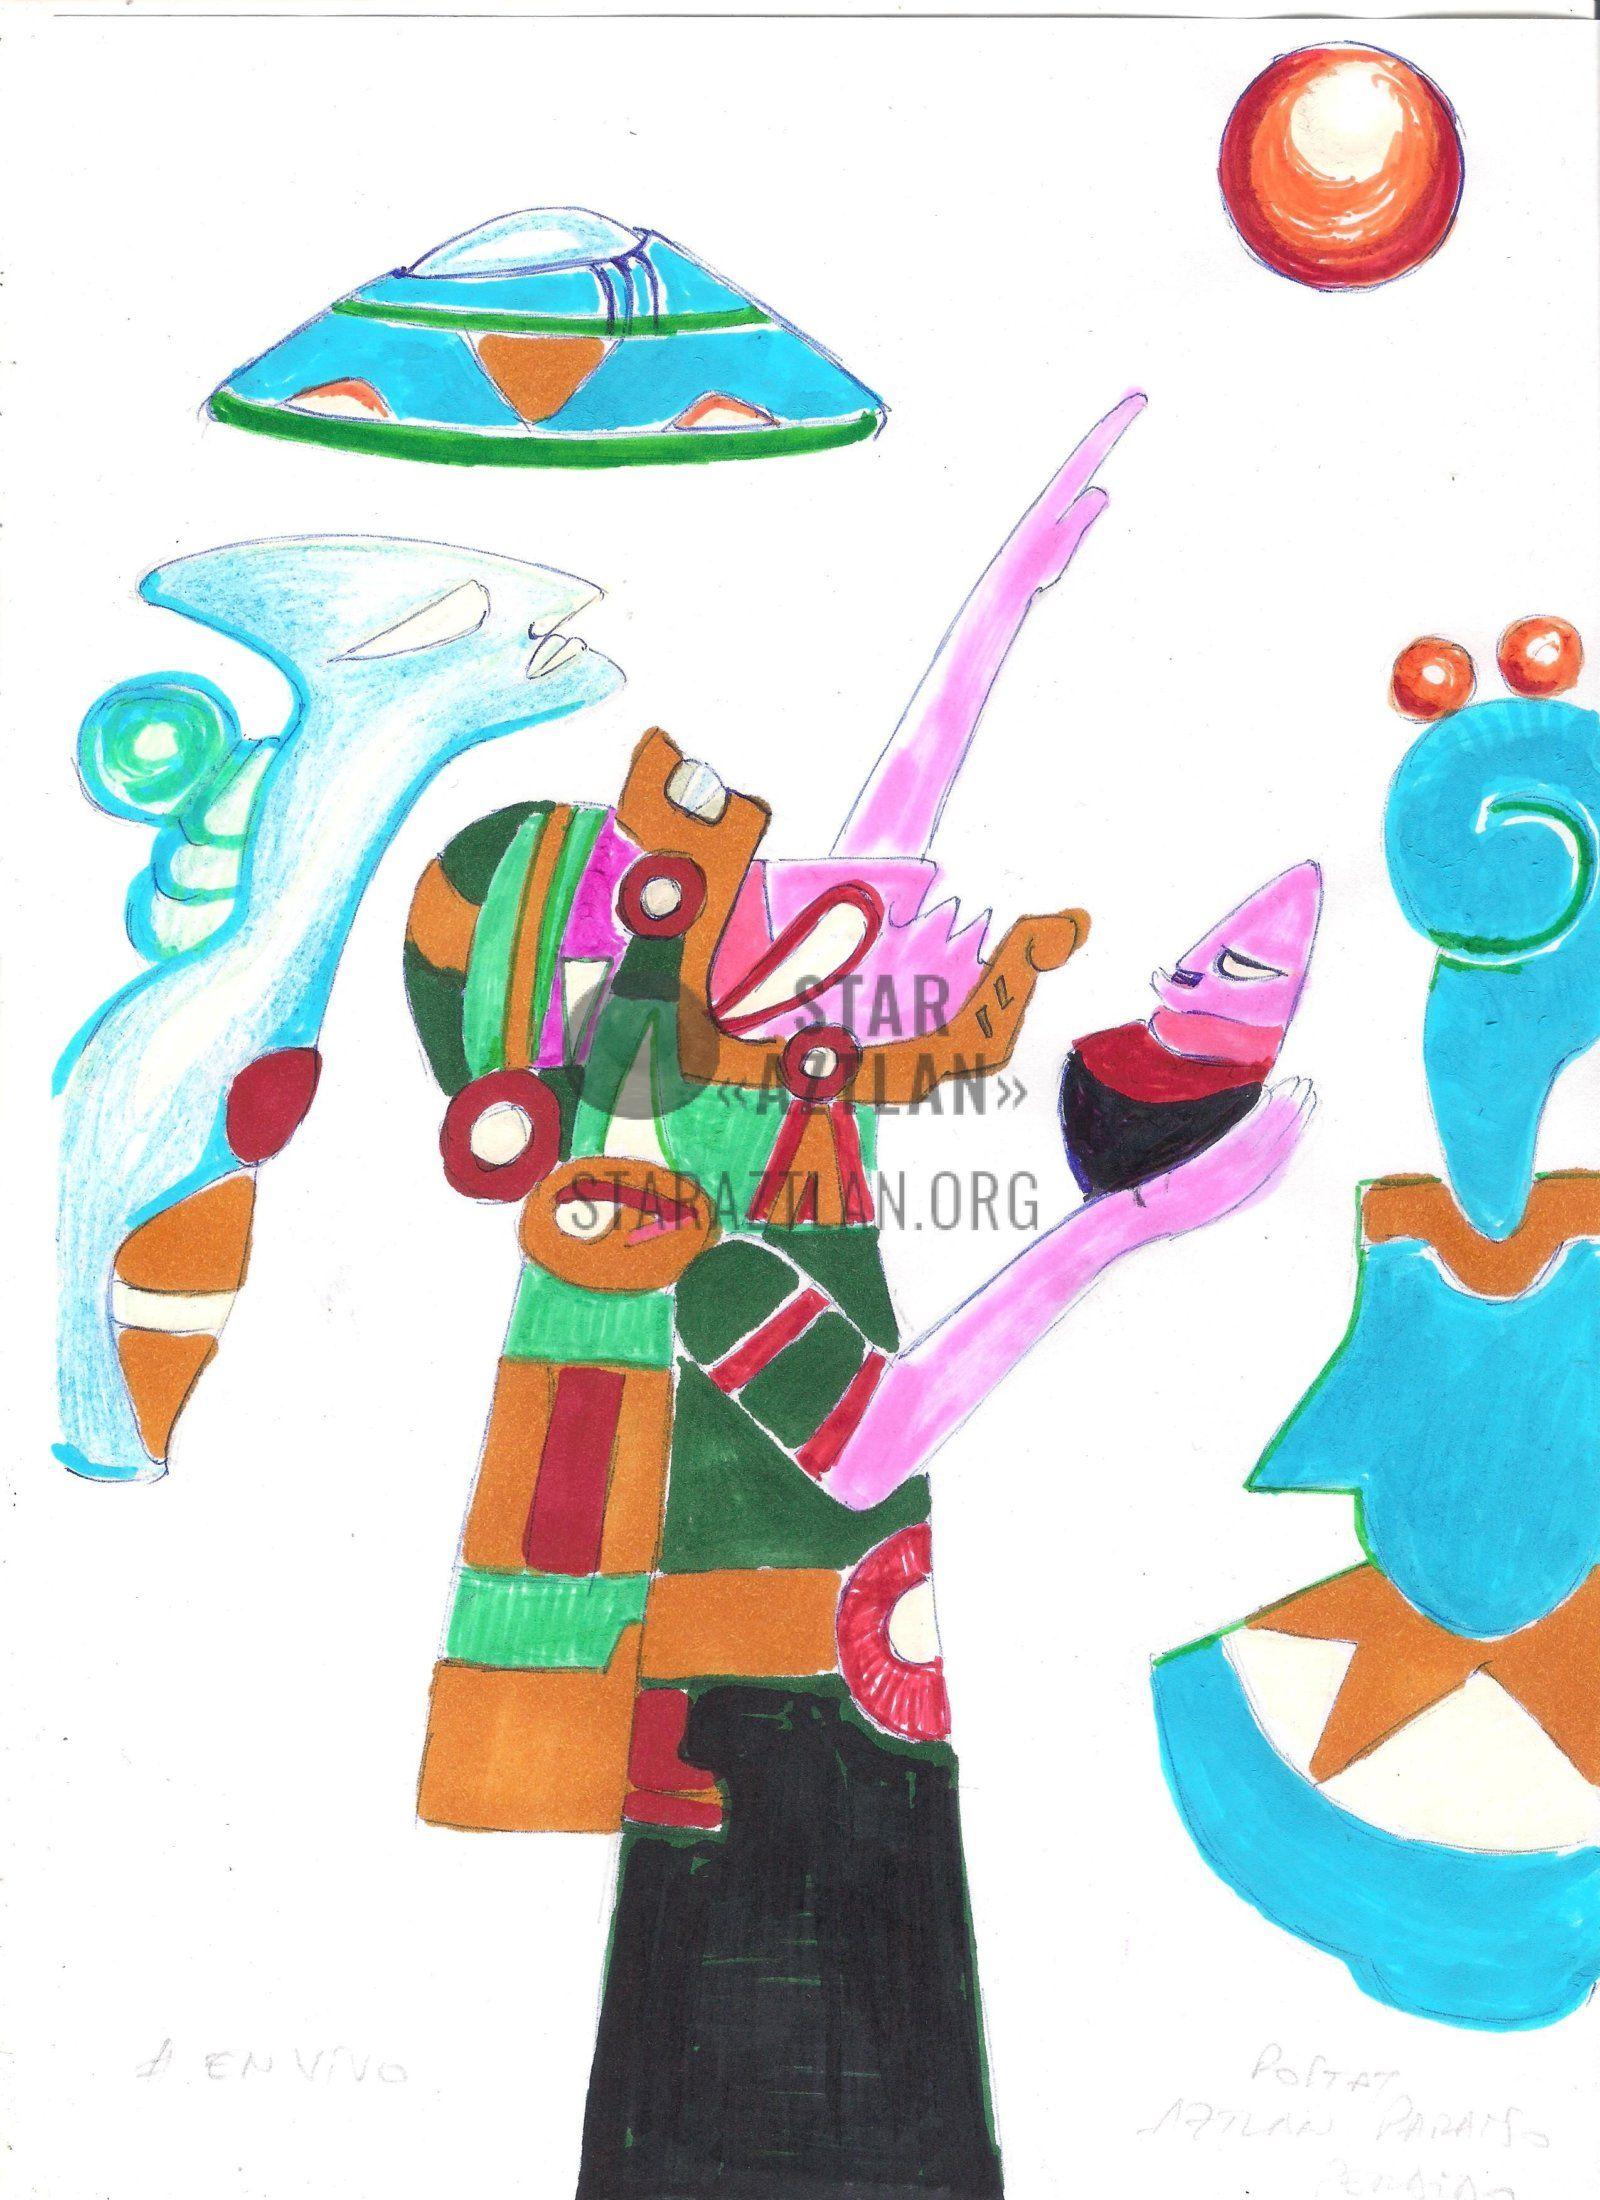 pictures_on_topic (24) | Древние пришельцы, Выставки, Рисунки